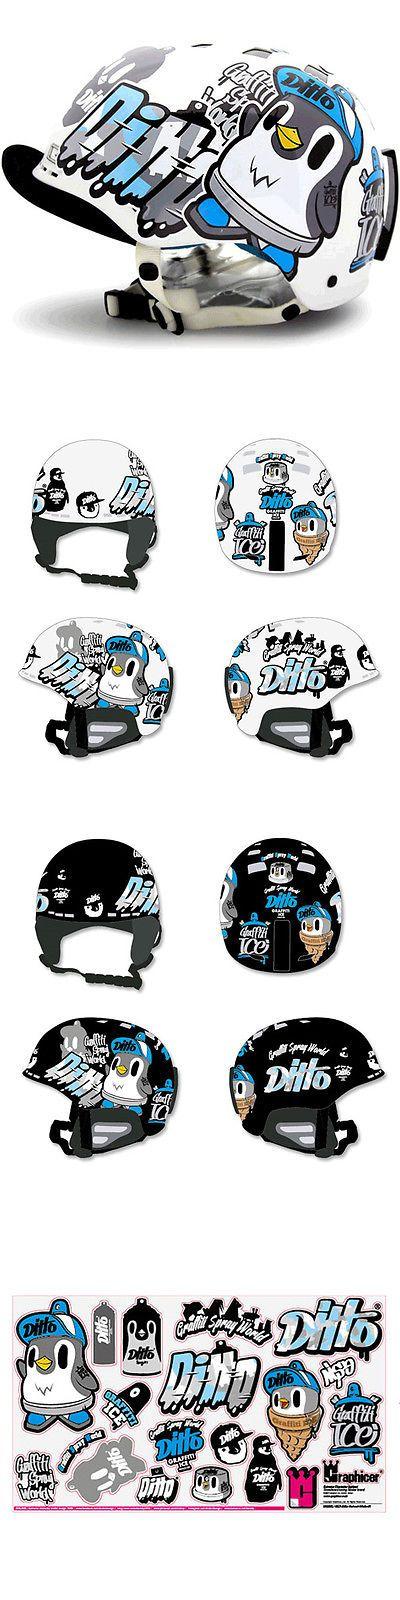 Helmet Accessories 177865: Motorcycle Helmet Decal Sticker Snowboarding Biker Hard Hat Stickers - Ditto 01 -> BUY IT NOW ONLY: $38.9 on eBay!